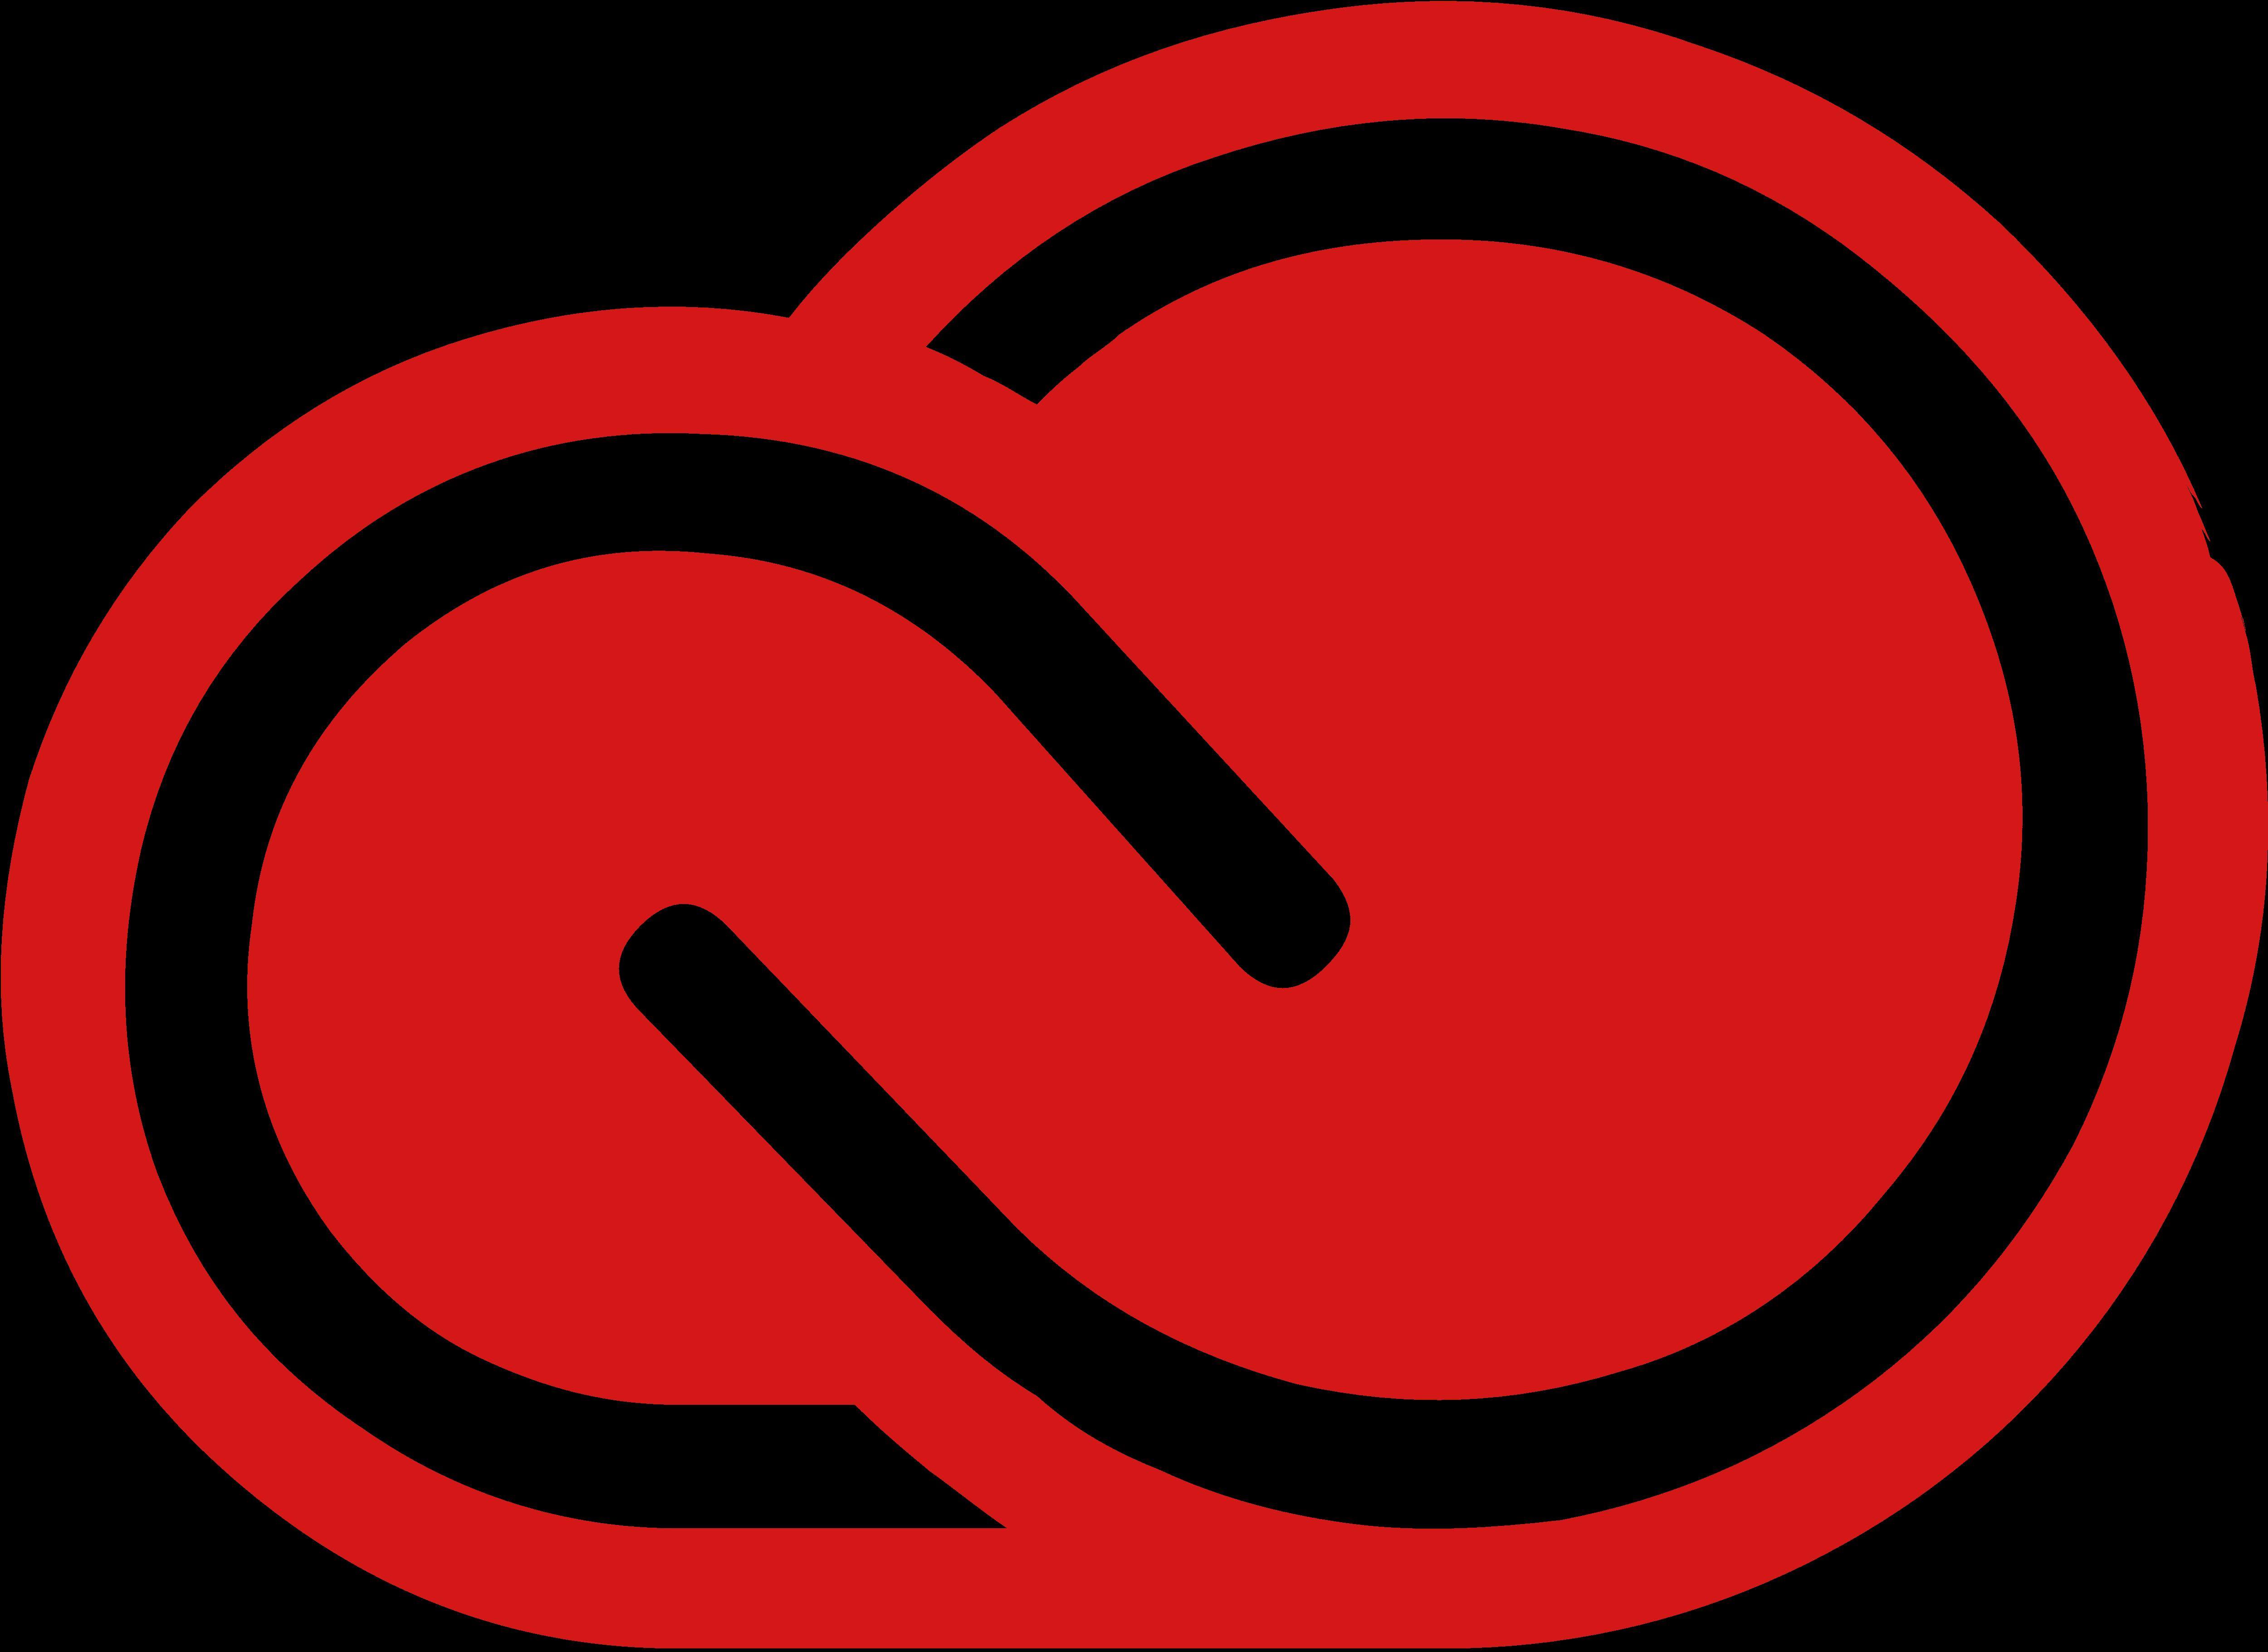 Adobe Creative Cloud Logo PNG